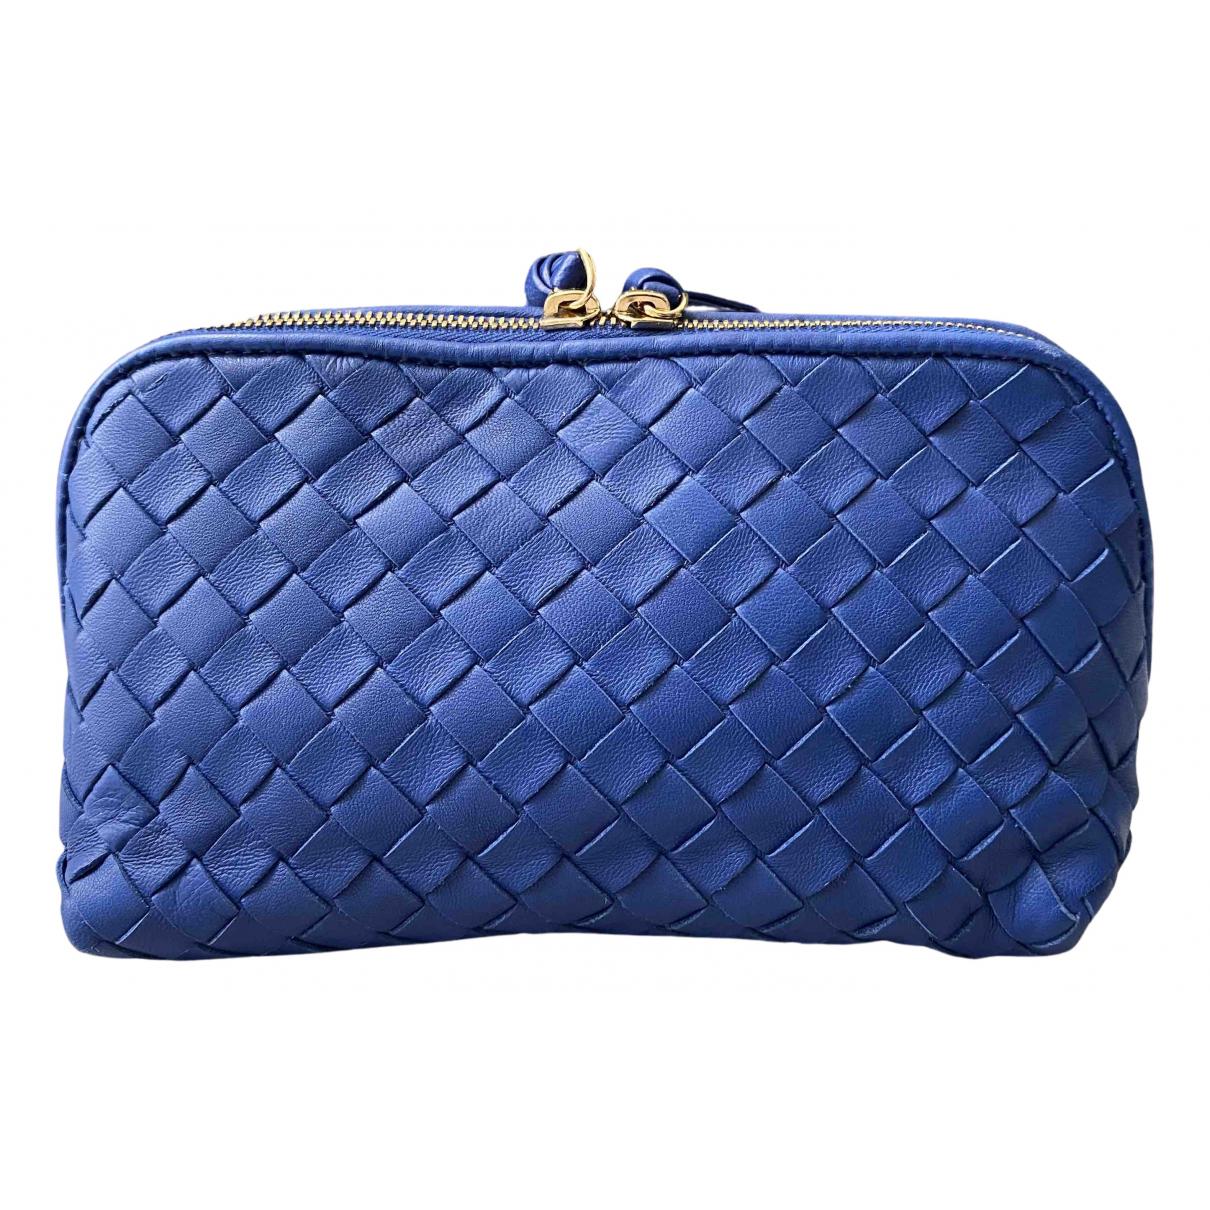 Bottega Veneta - Sac de voyage   pour femme en cuir - bleu